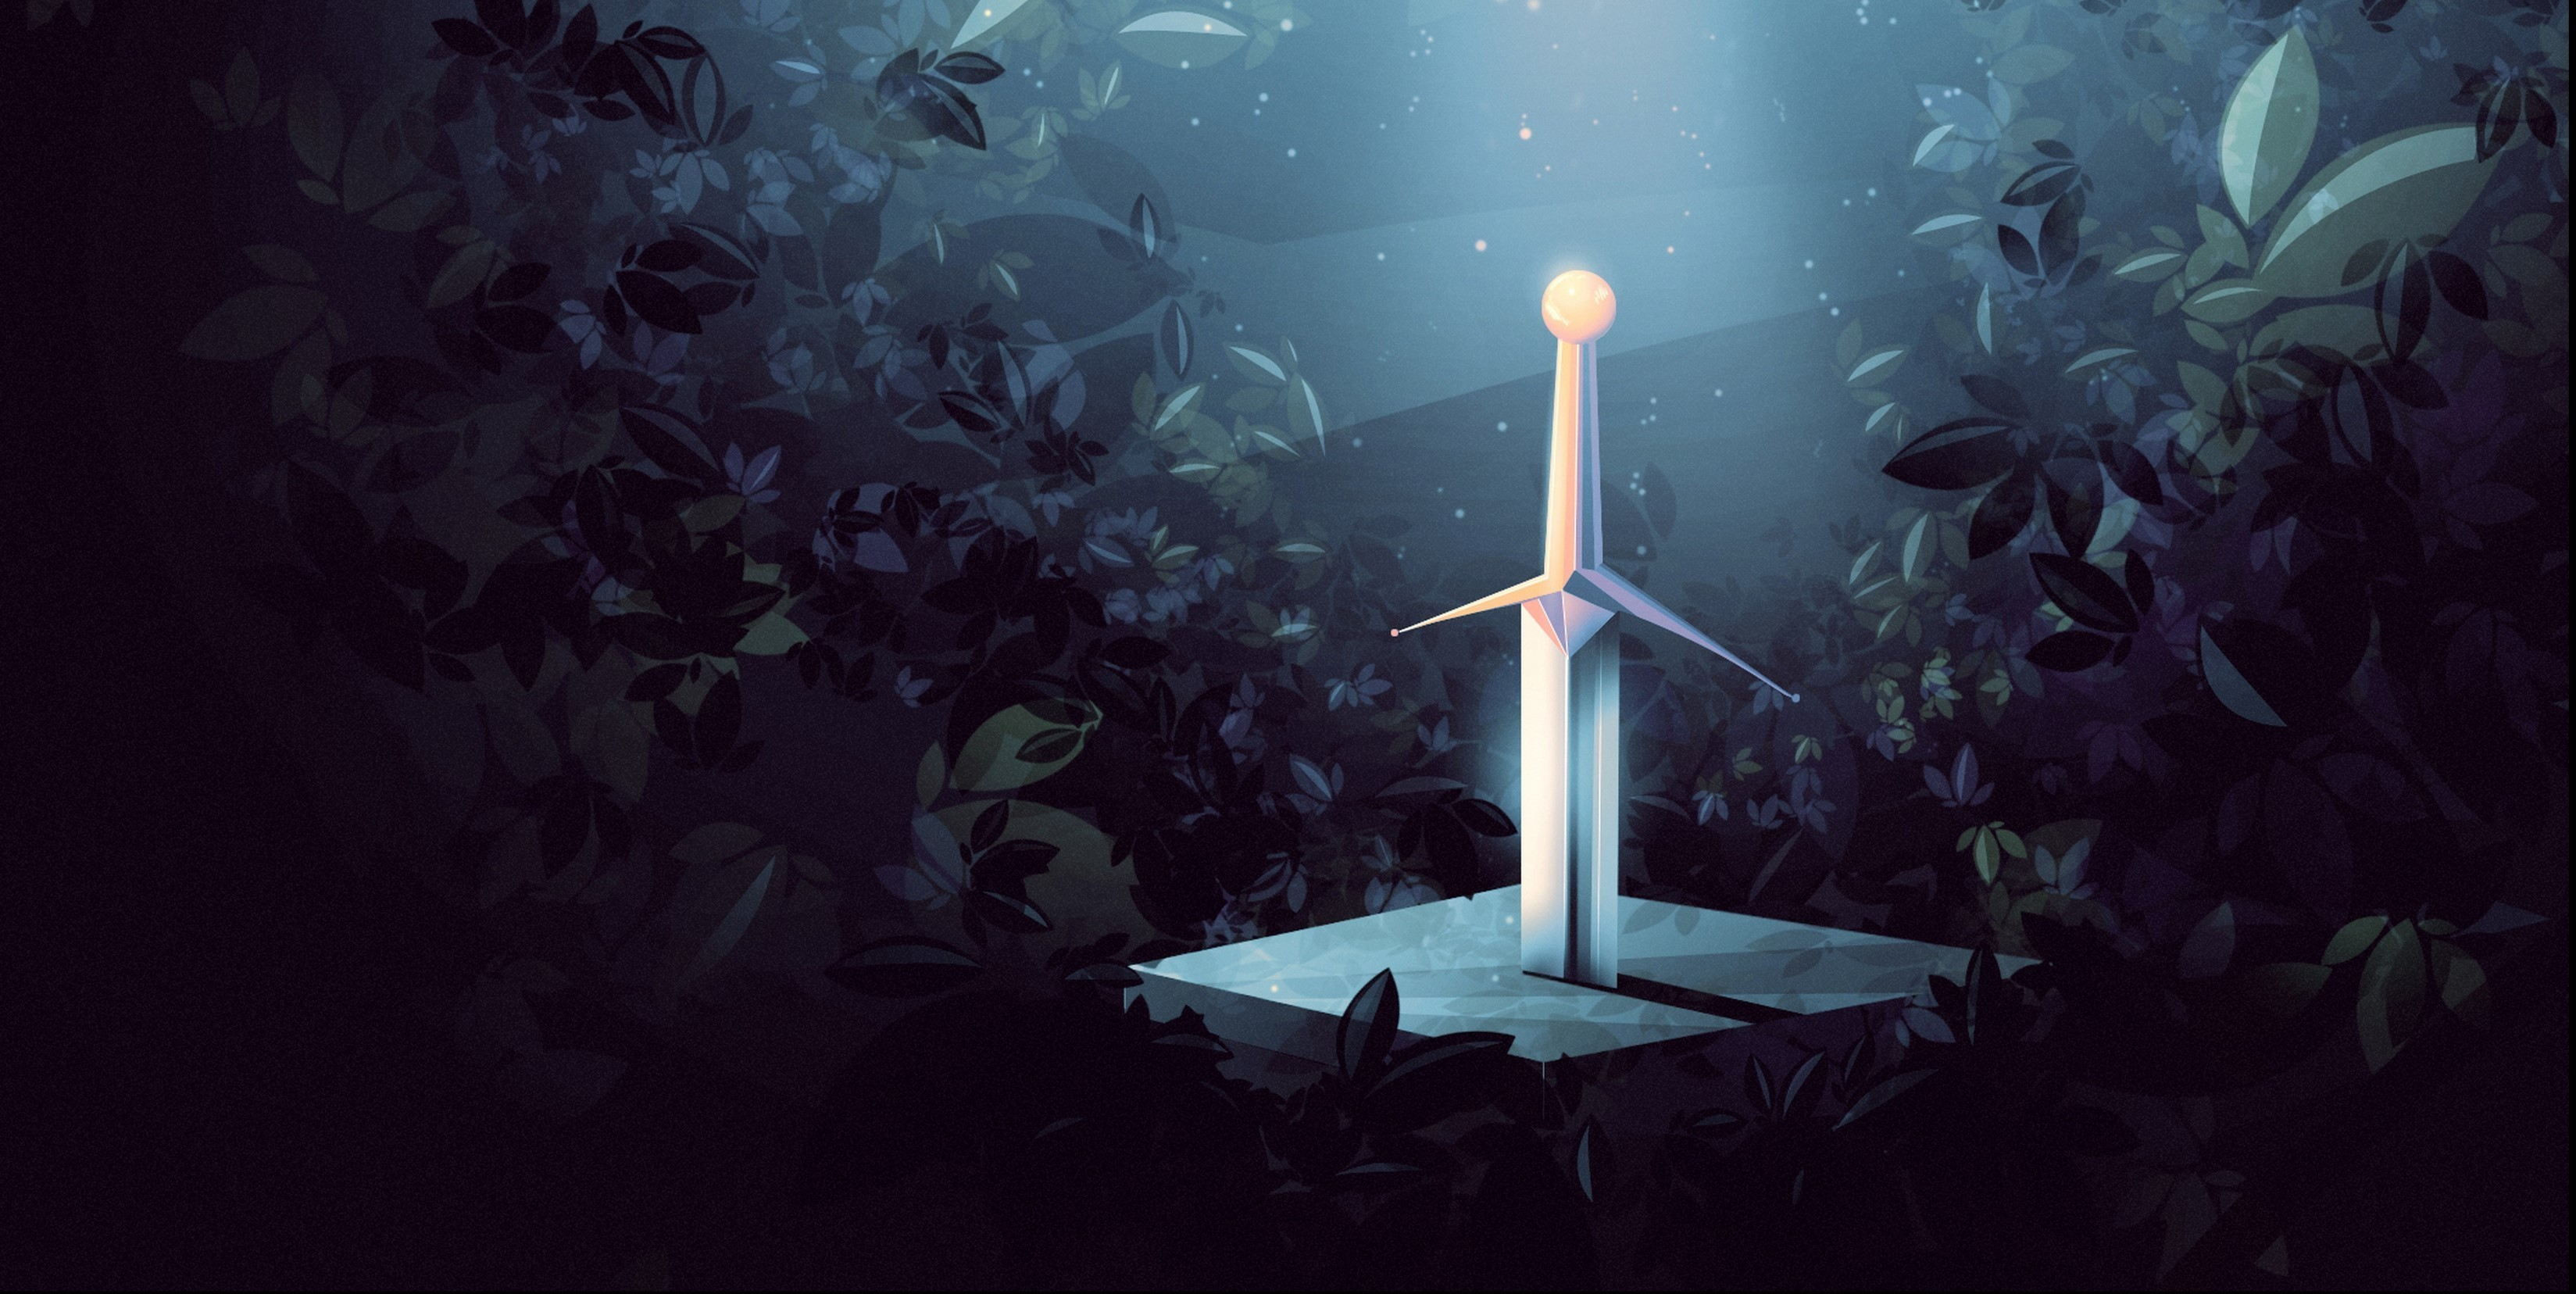 General 3297x1656 Excalibur fantasy art artwork sword 3297x1656